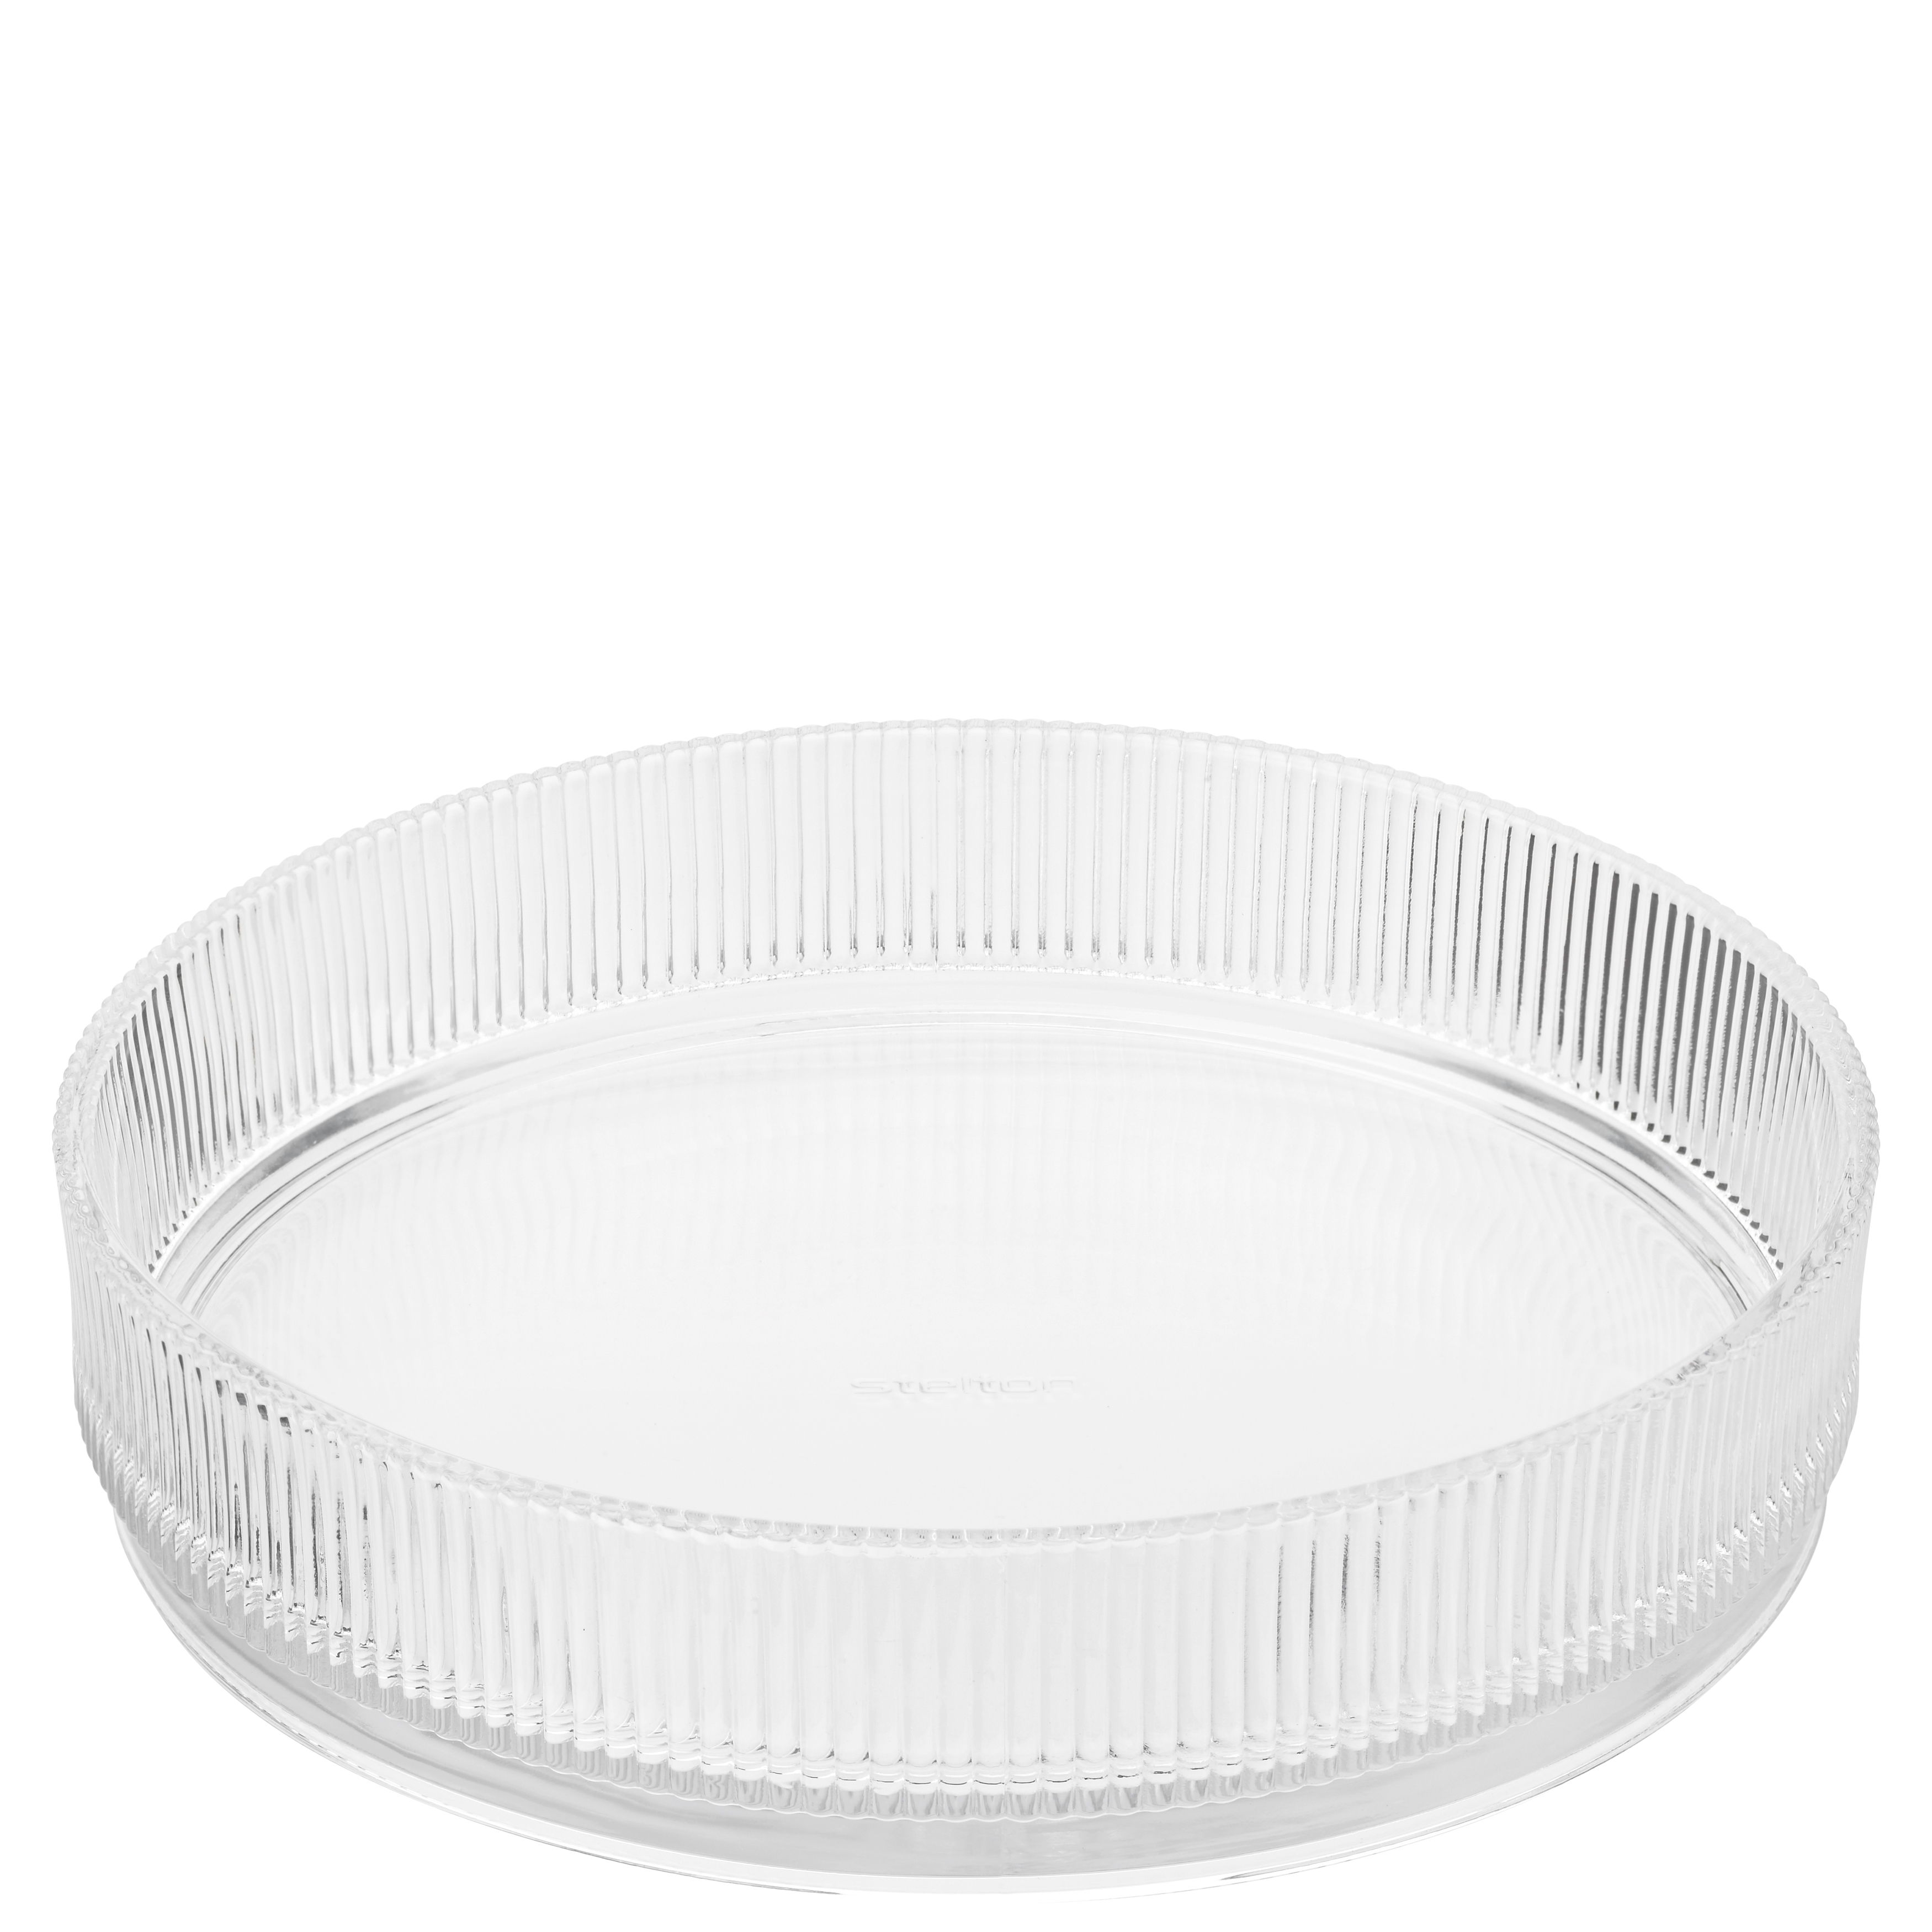 Stelton Pilastro serveringsskål, Ø23 cm